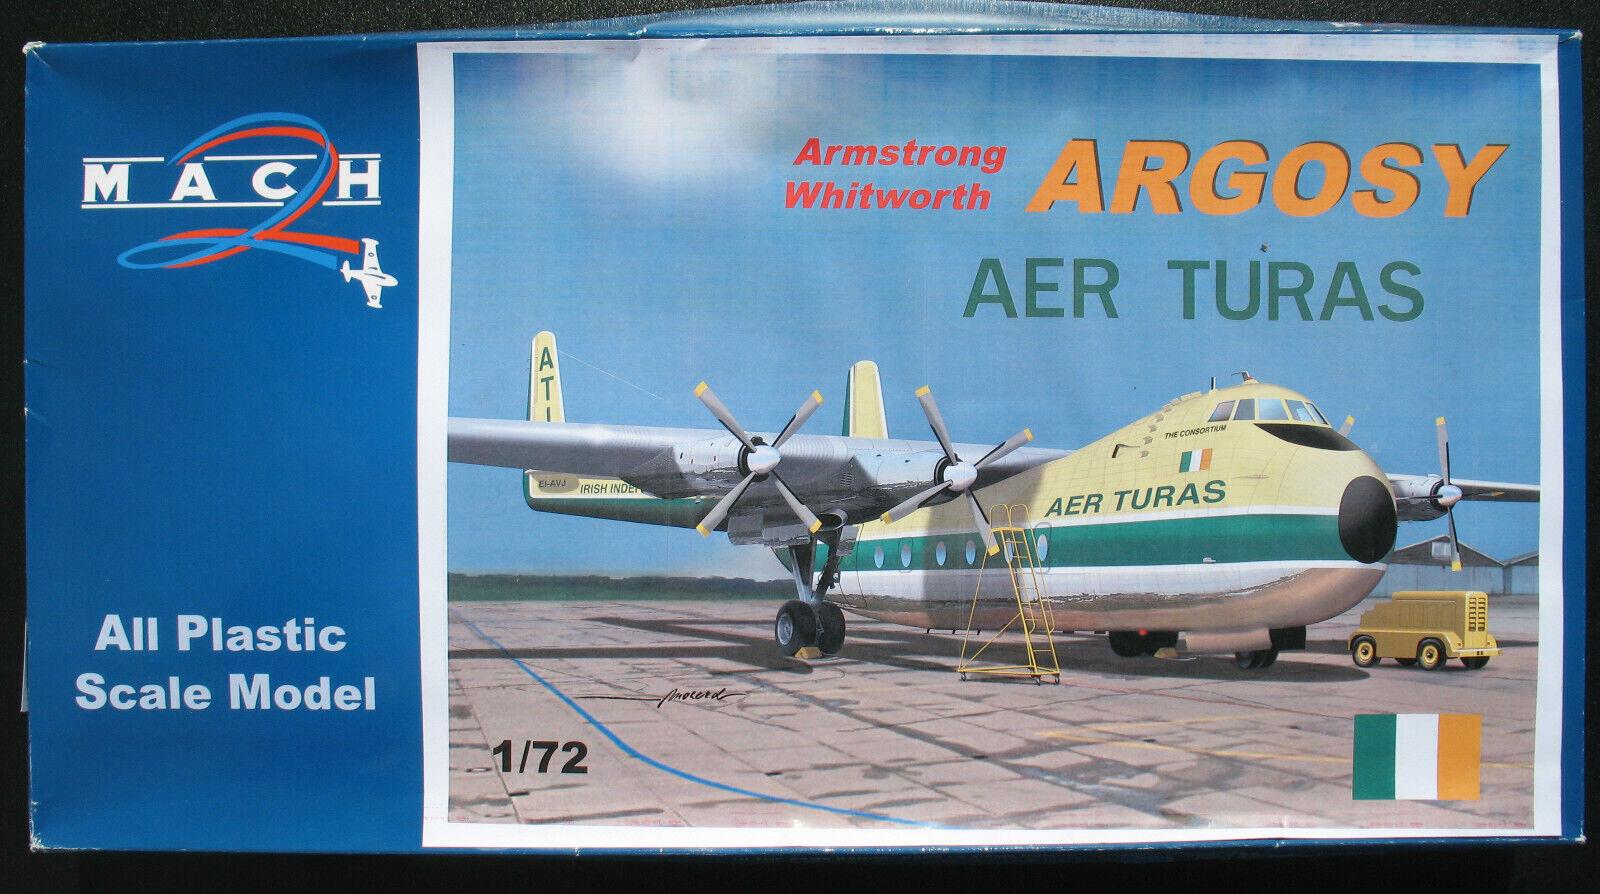 MACH 2 GP089 - Armstrong Whitworth ARGOSY AER TURAS - 1 72 -Flugzeug Bausatz Kit